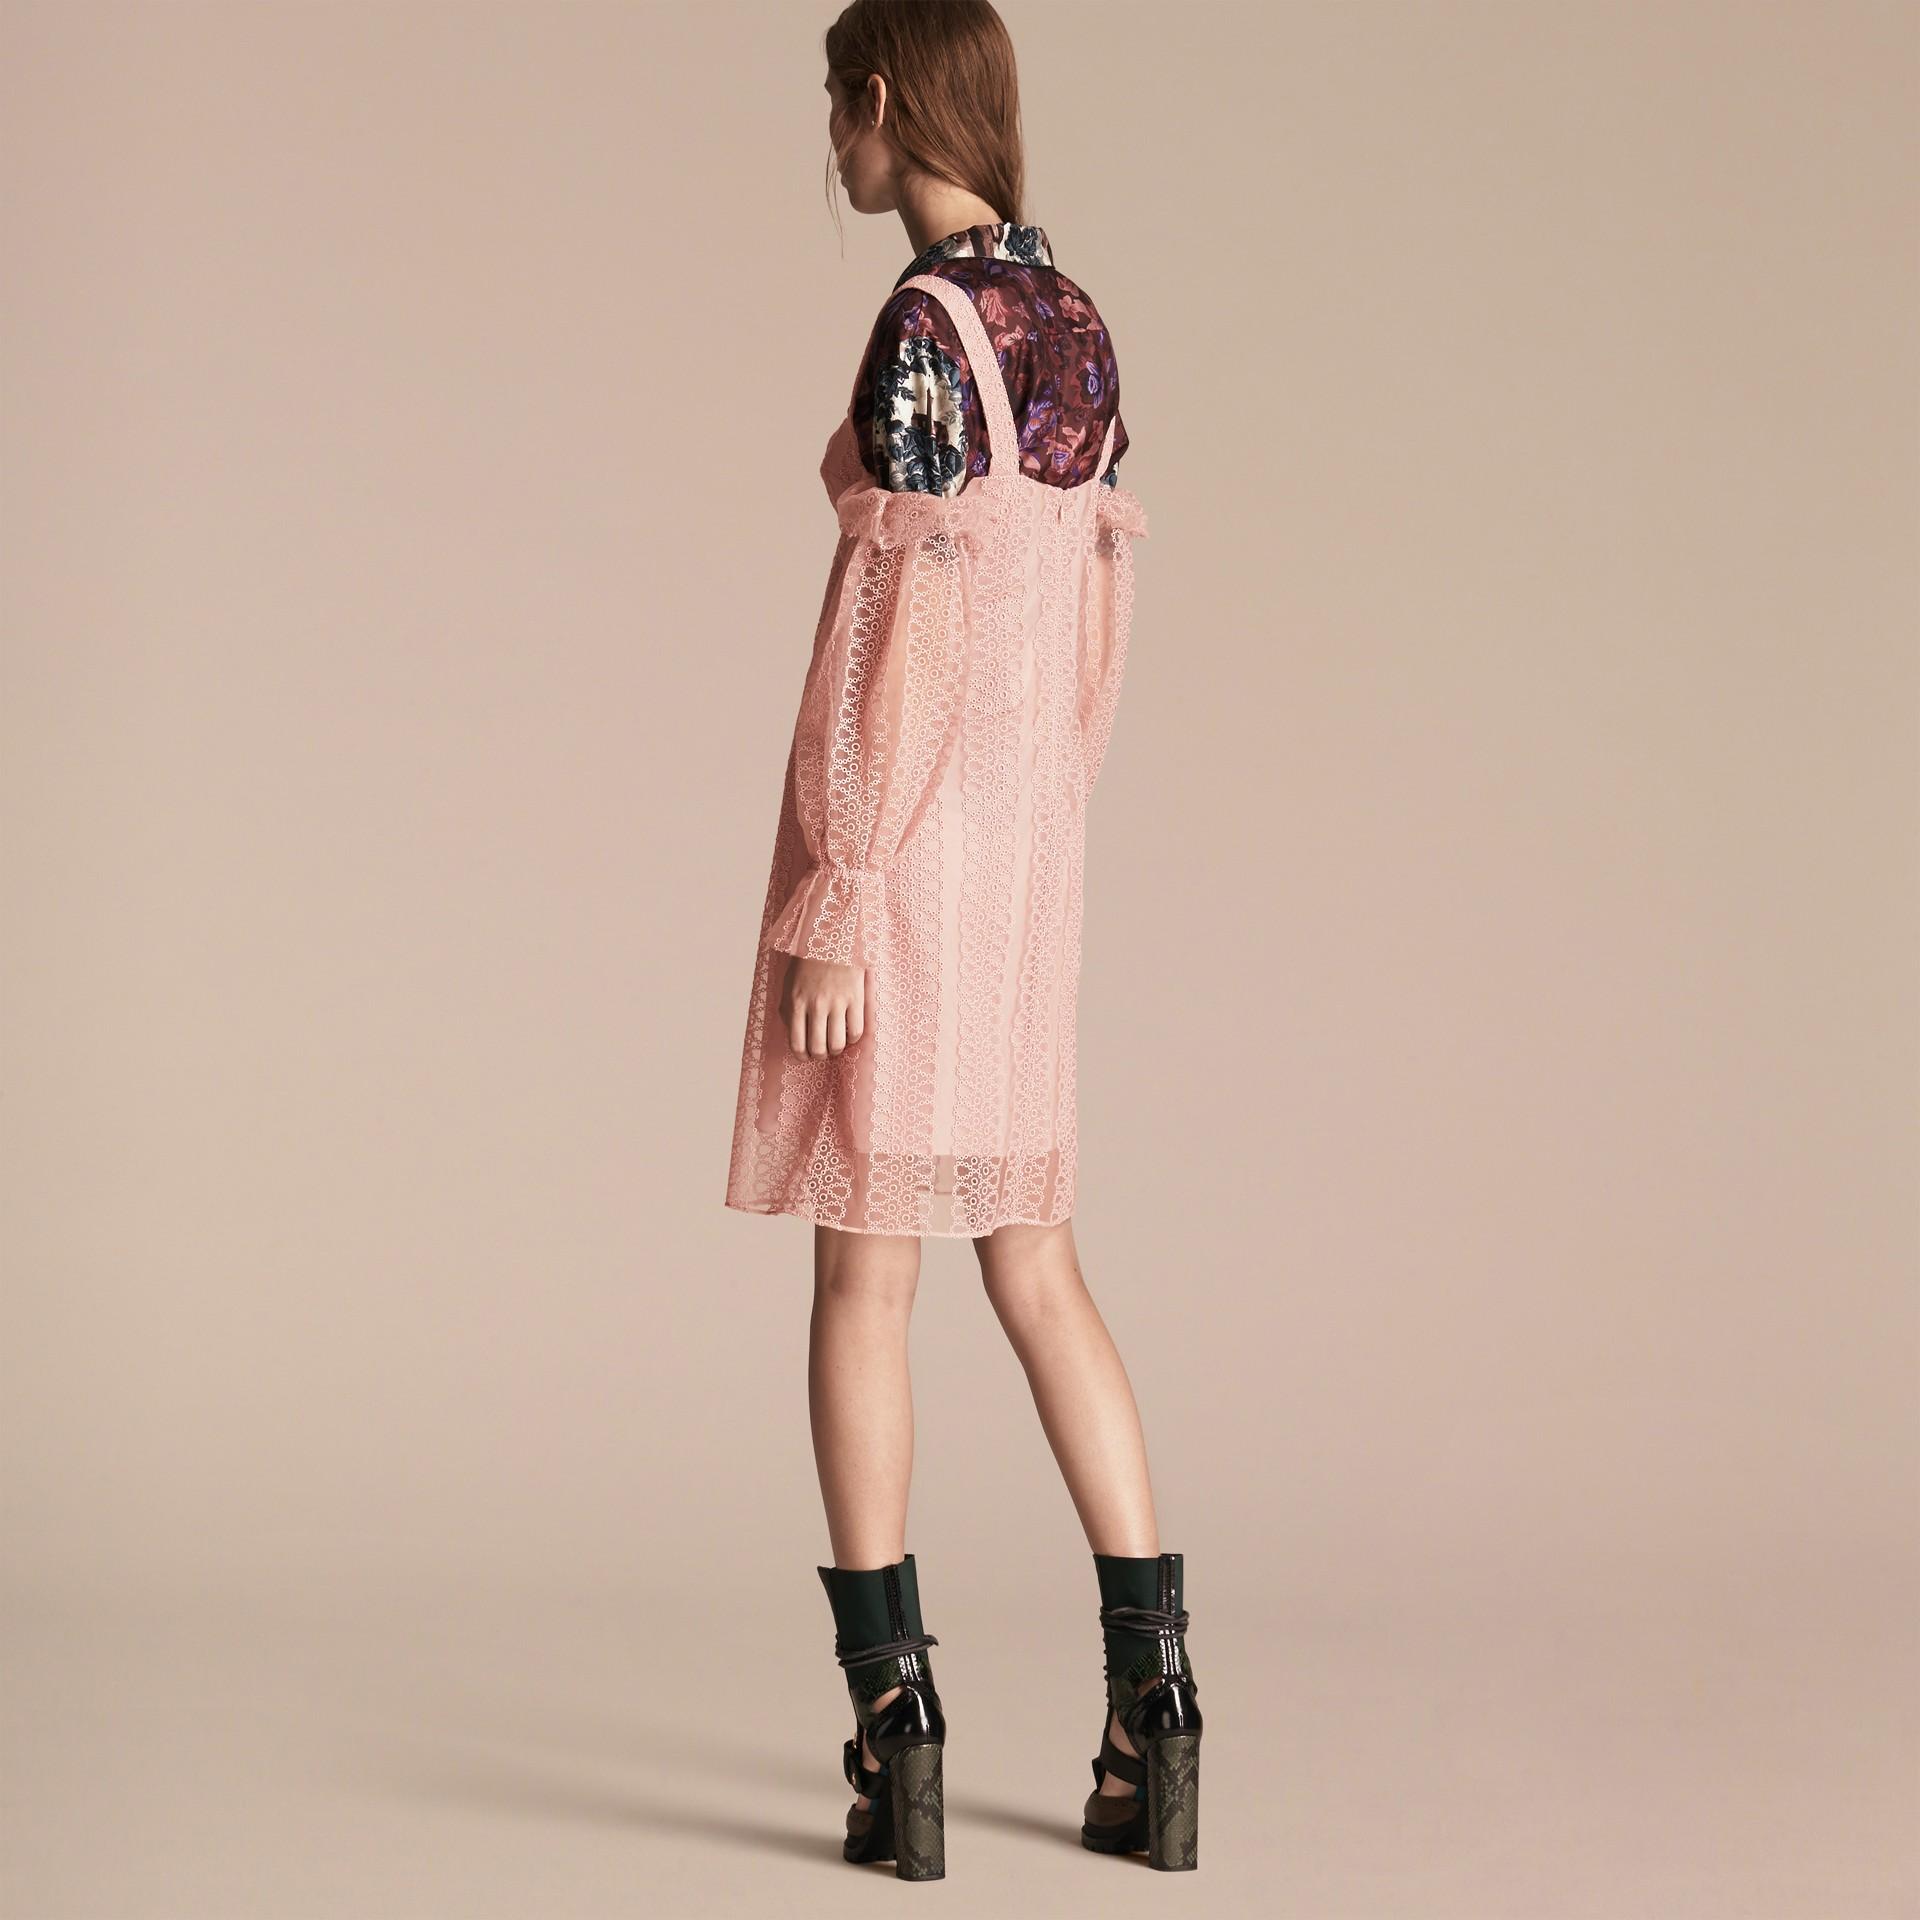 Helles rosenrosa Schulterfreies Kleid im Korsettstil aus Tüll mit Stickerei - Galerie-Bild 3